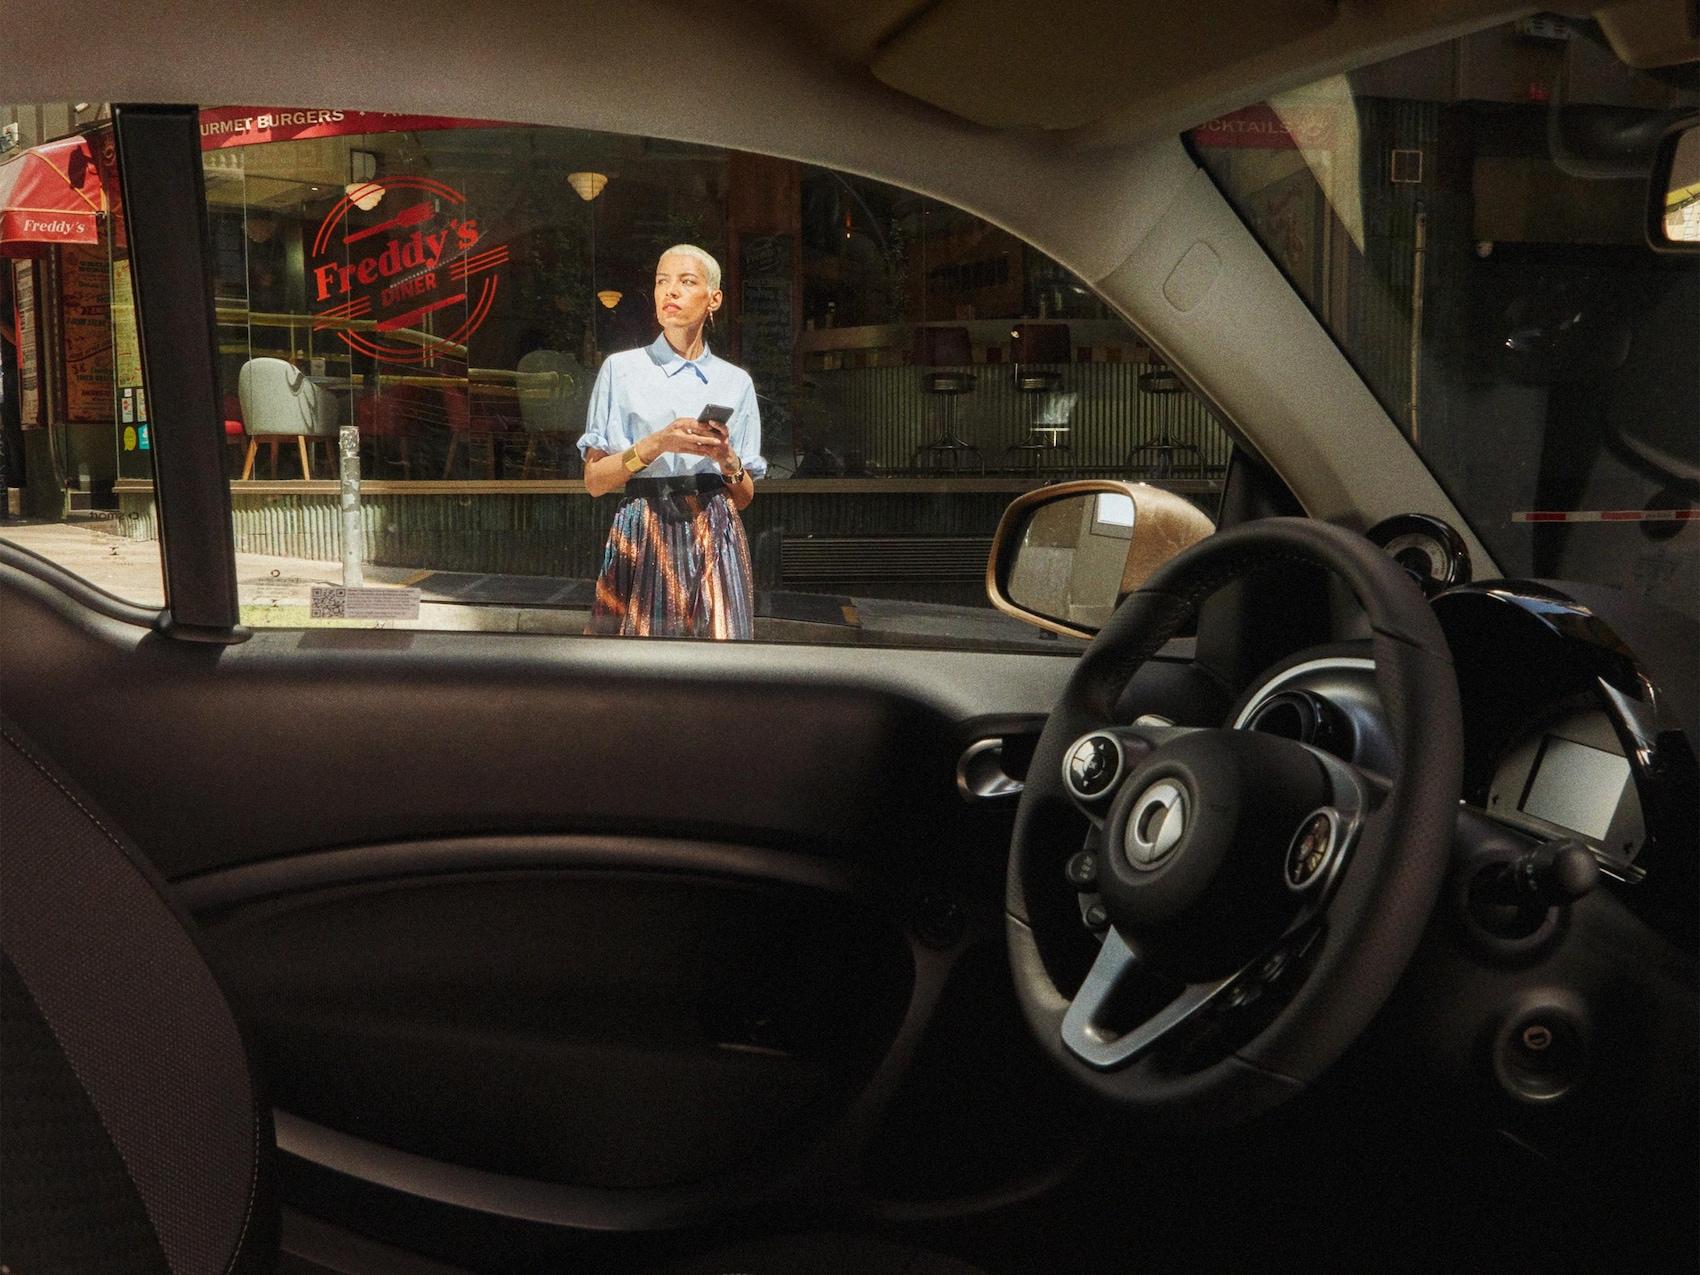 Geschäftskunden smart fleetshare LS Buchungsprozess